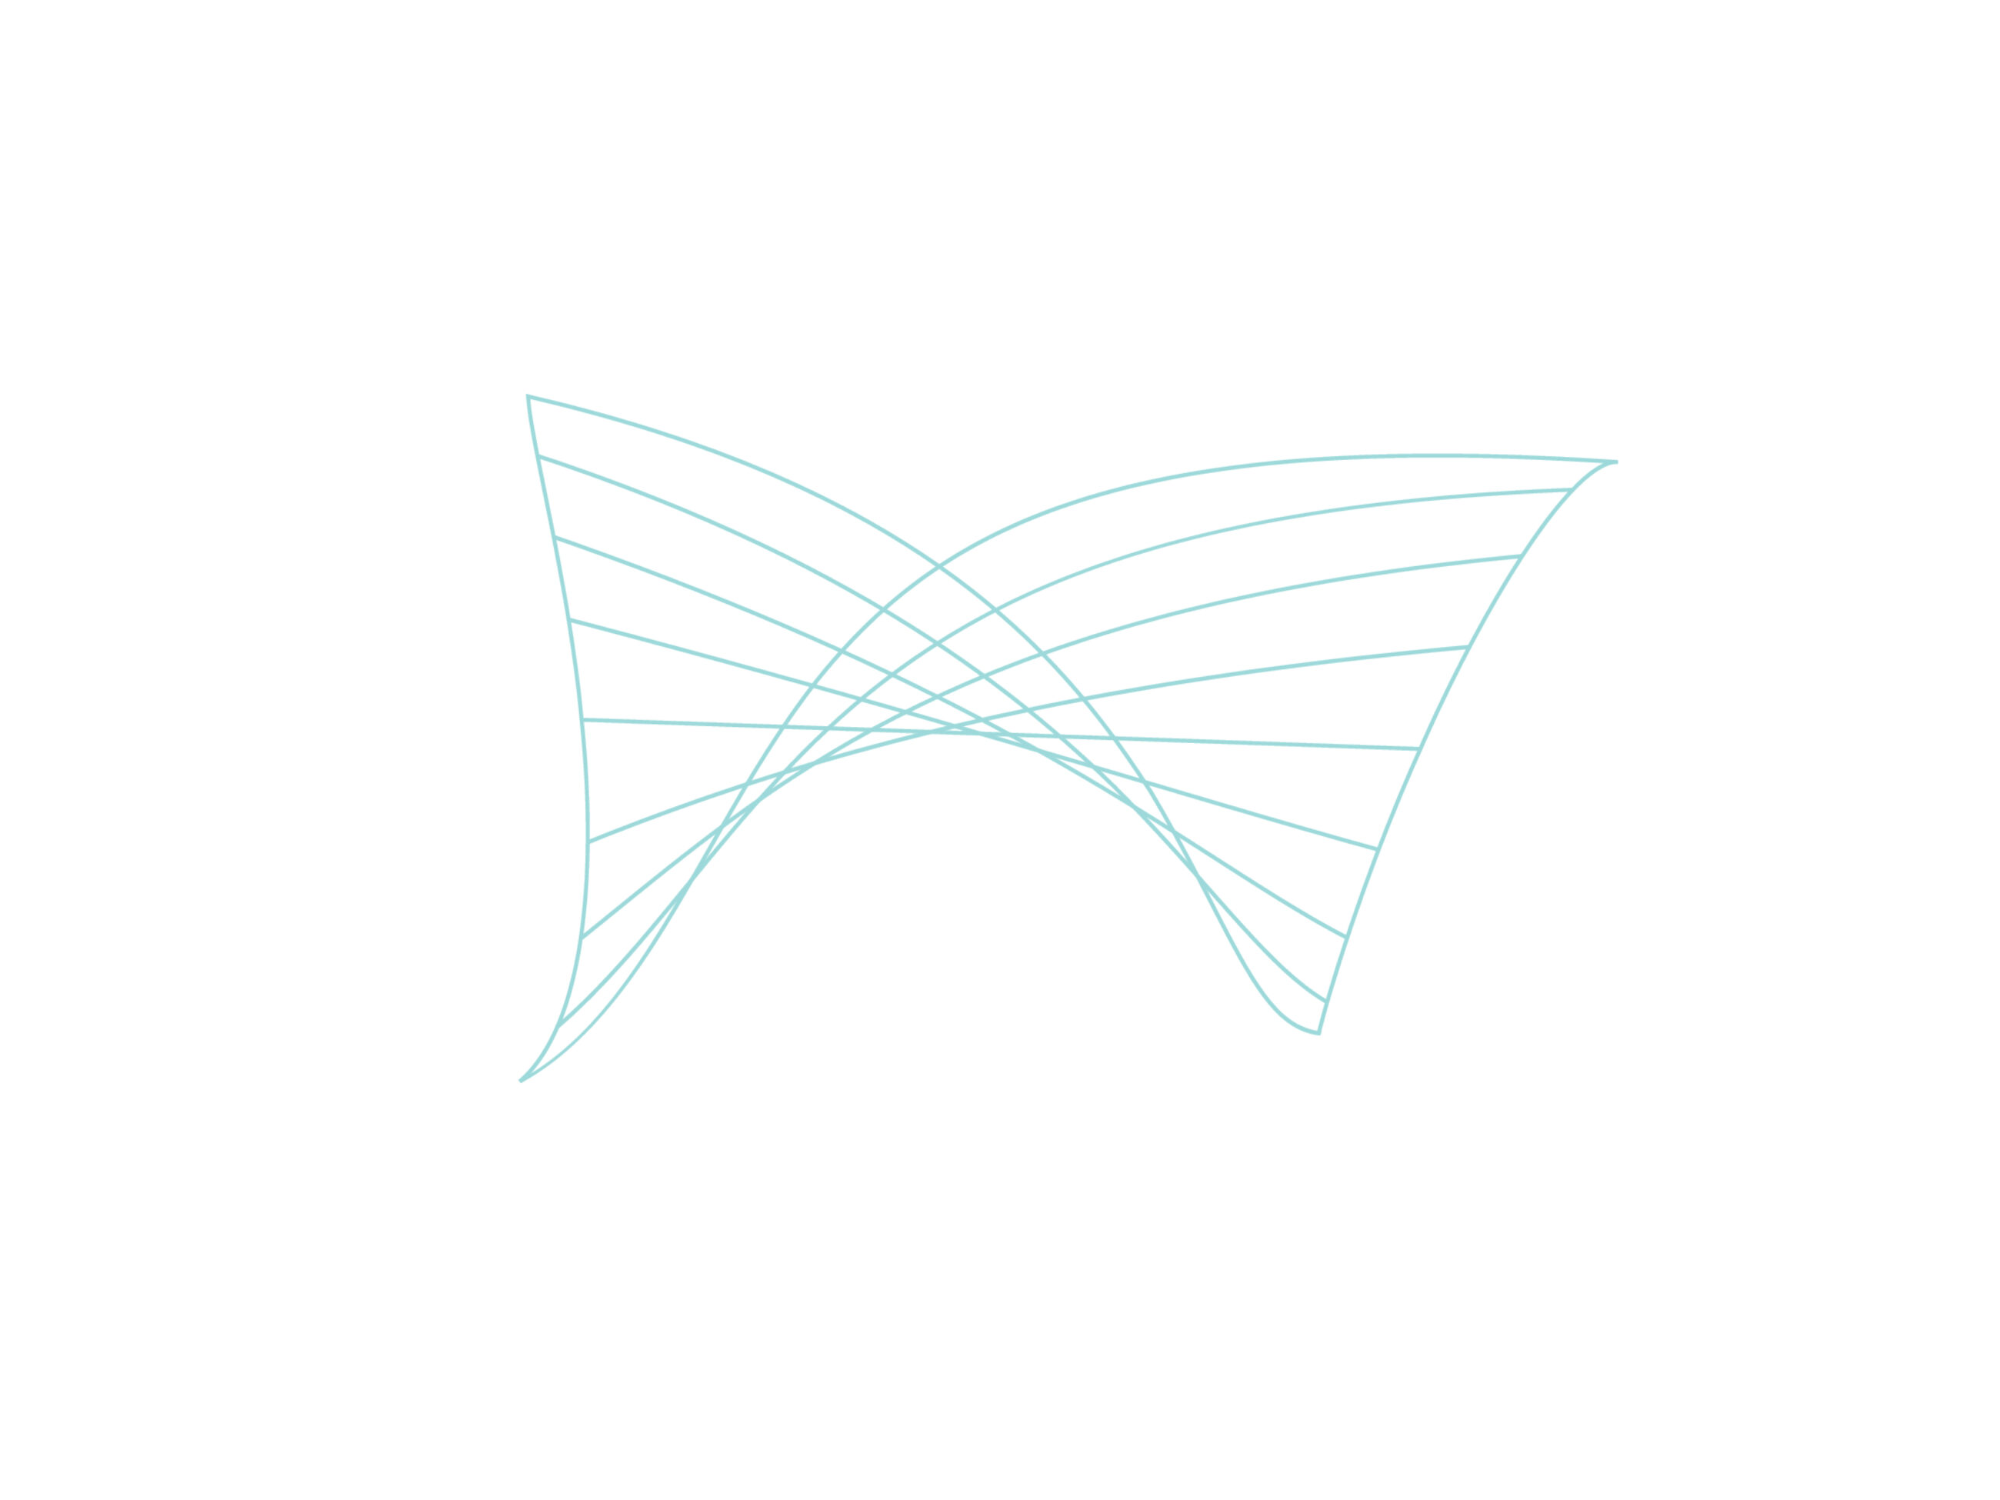 Voconiq - Branding example